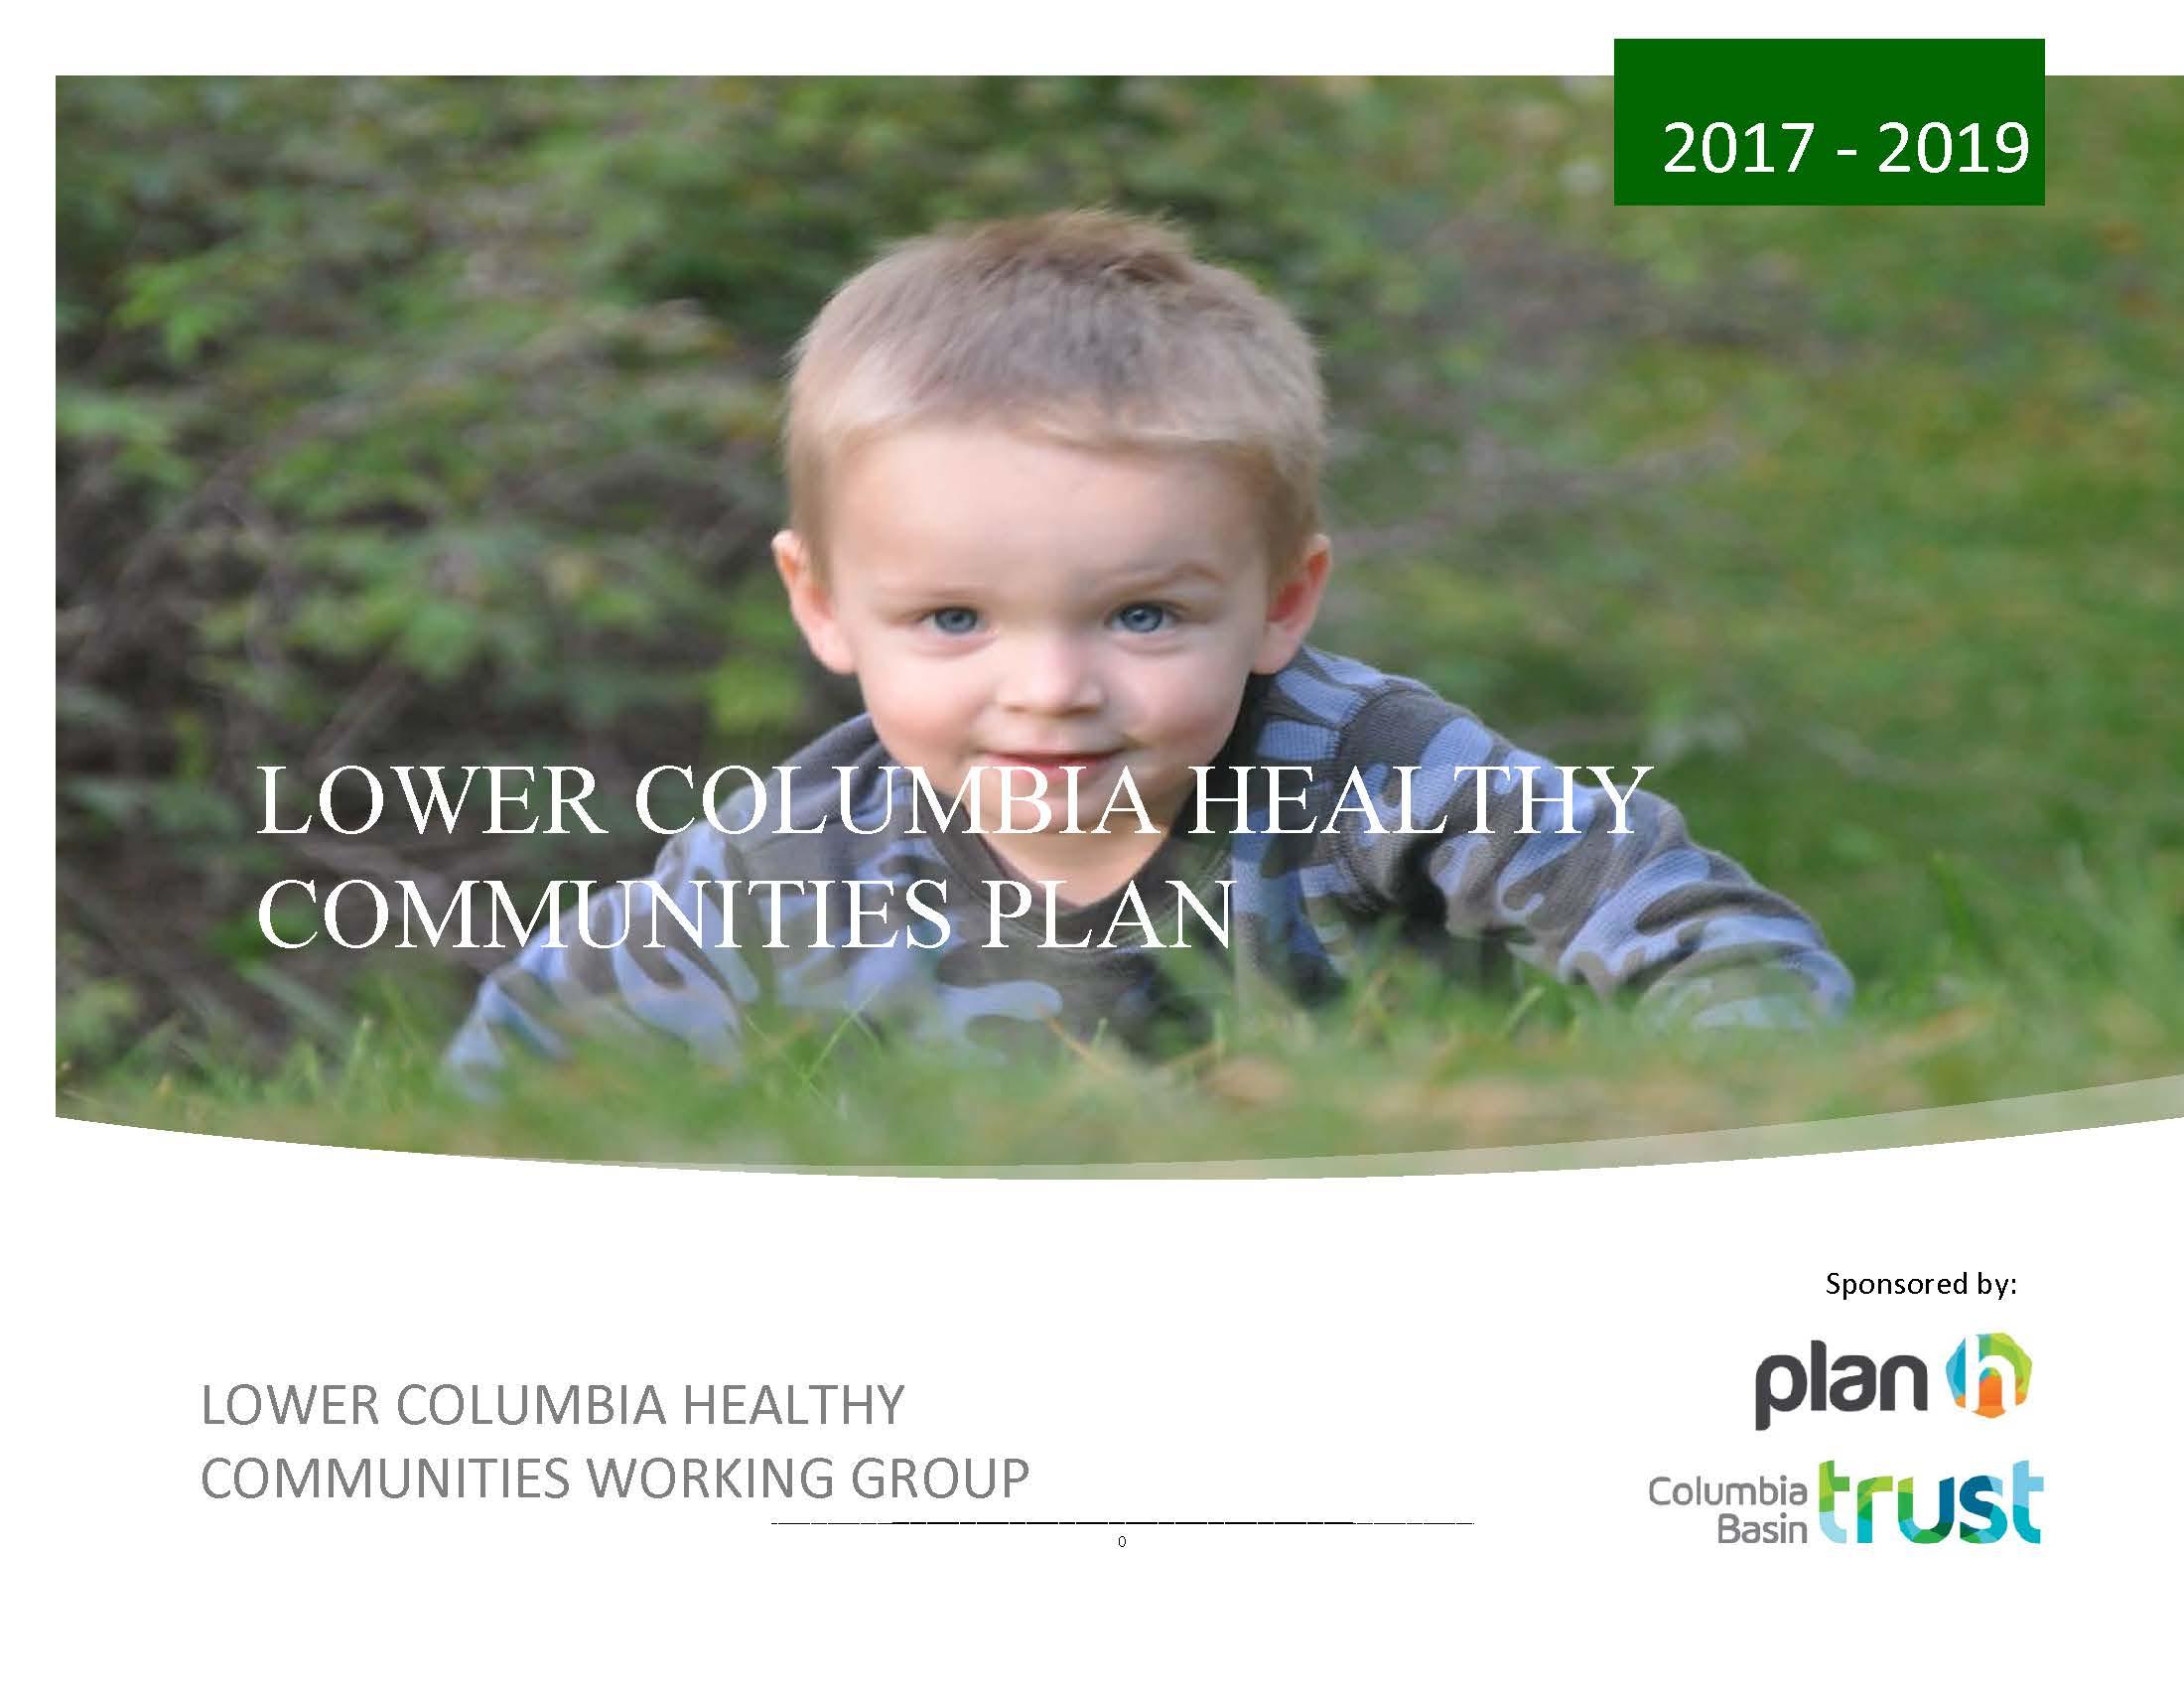 Lower Columbia Healthy Communities Plan